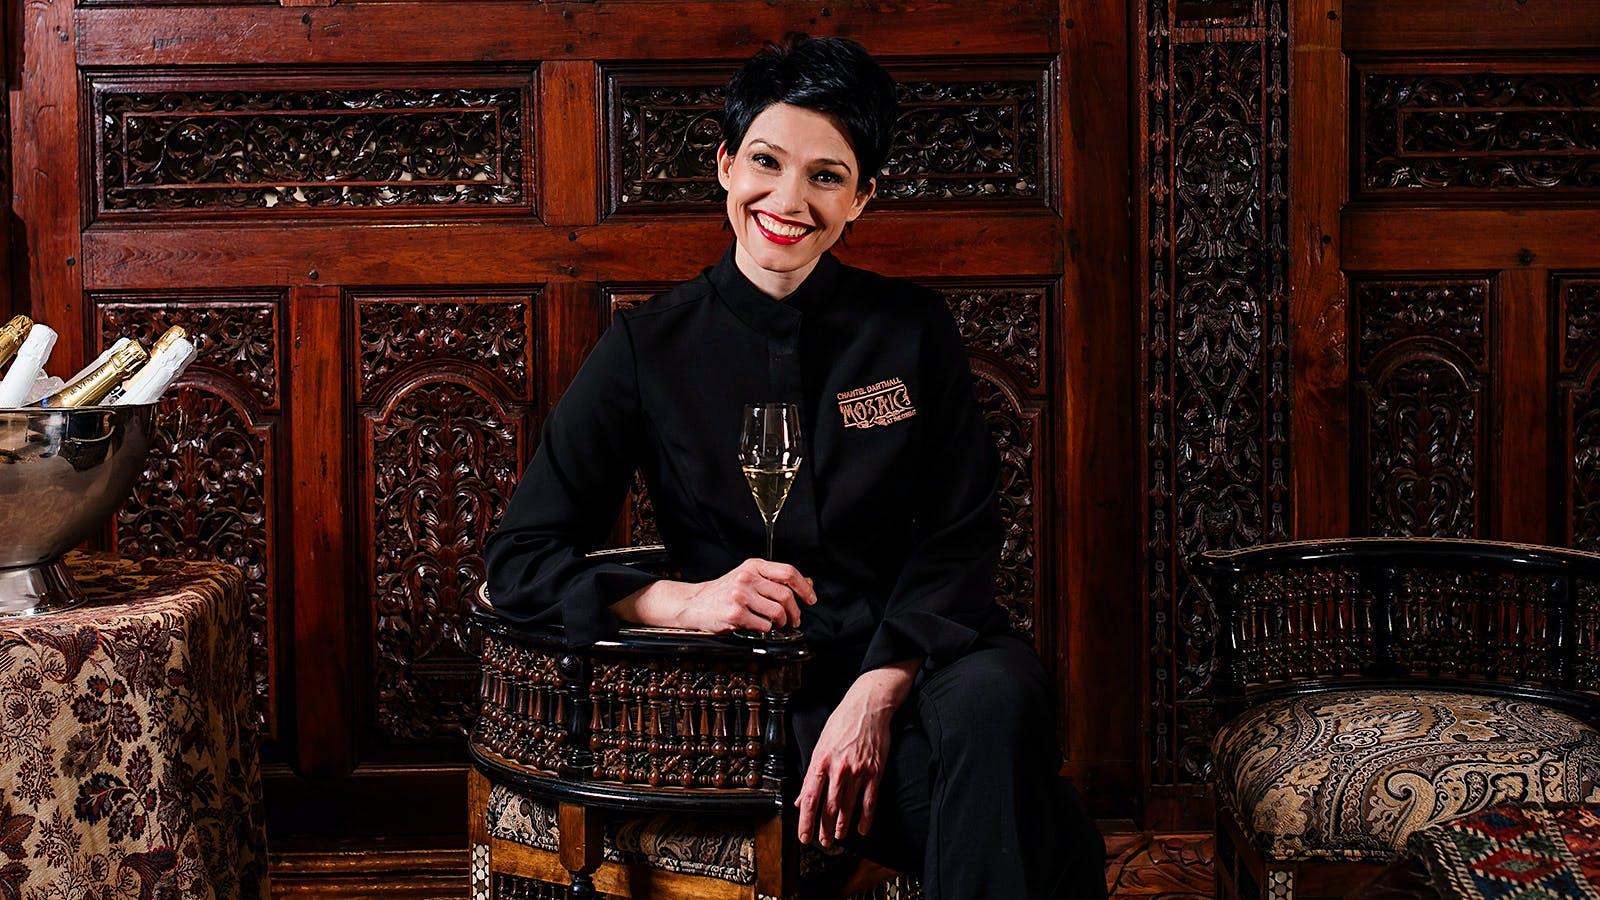 Chef Talk: Chantel Dartnall's South African Wine and Food Fantasia